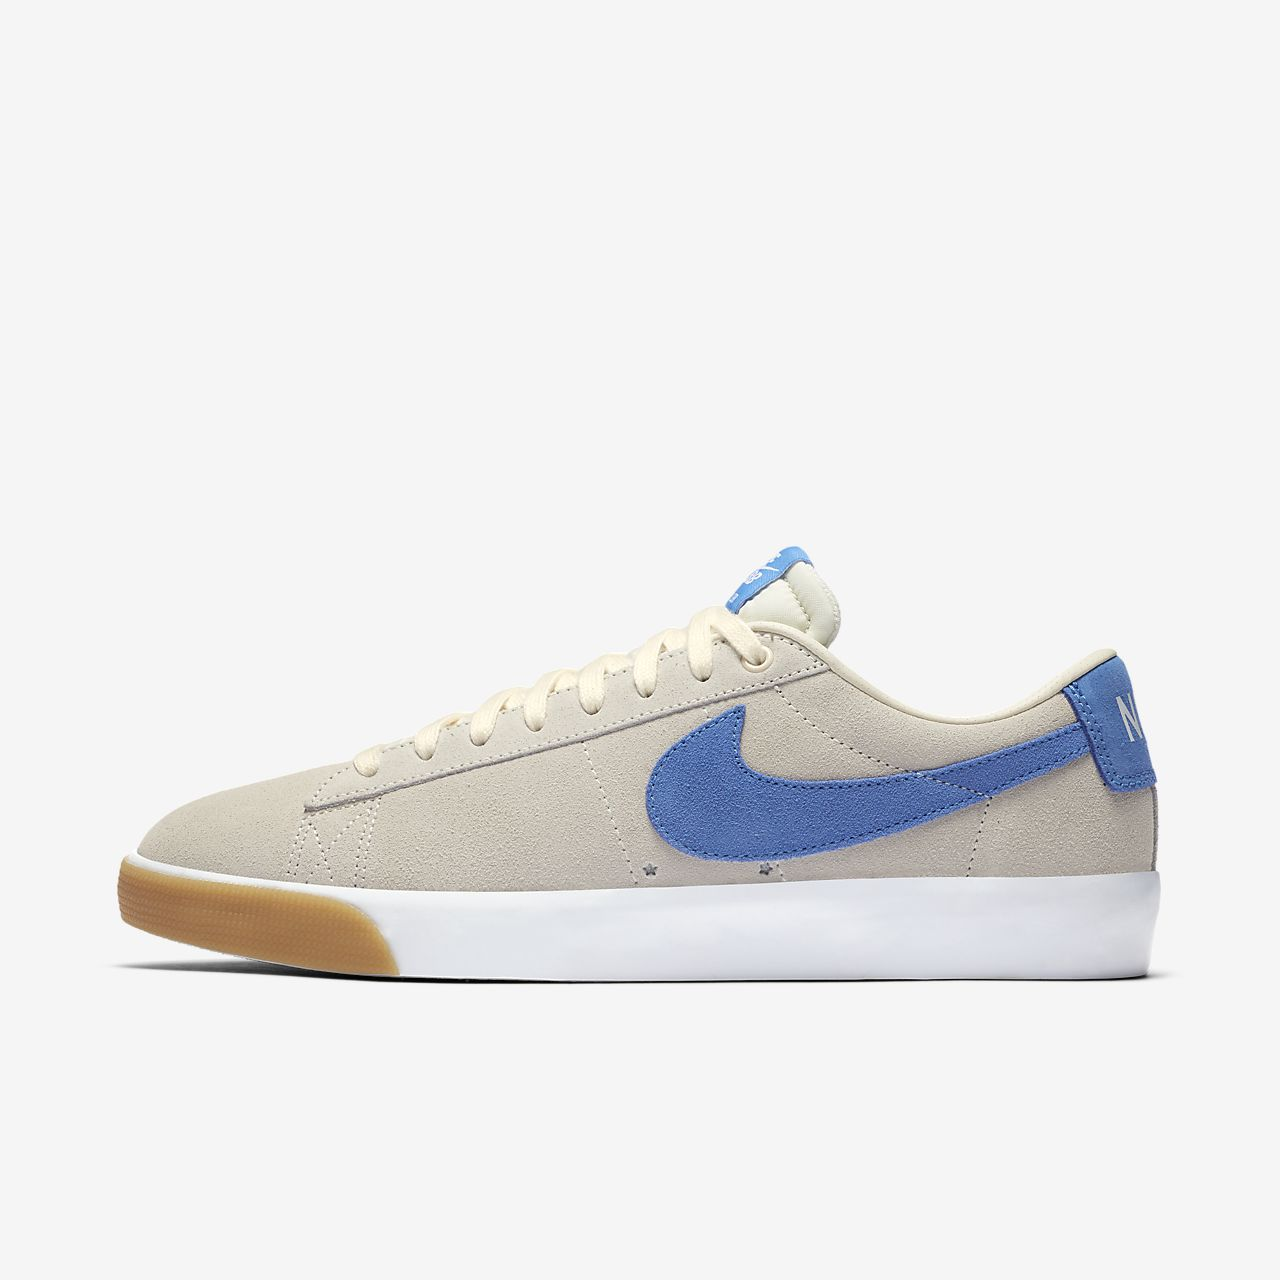 Skateboardová bota Nike SB Blazer Low GT